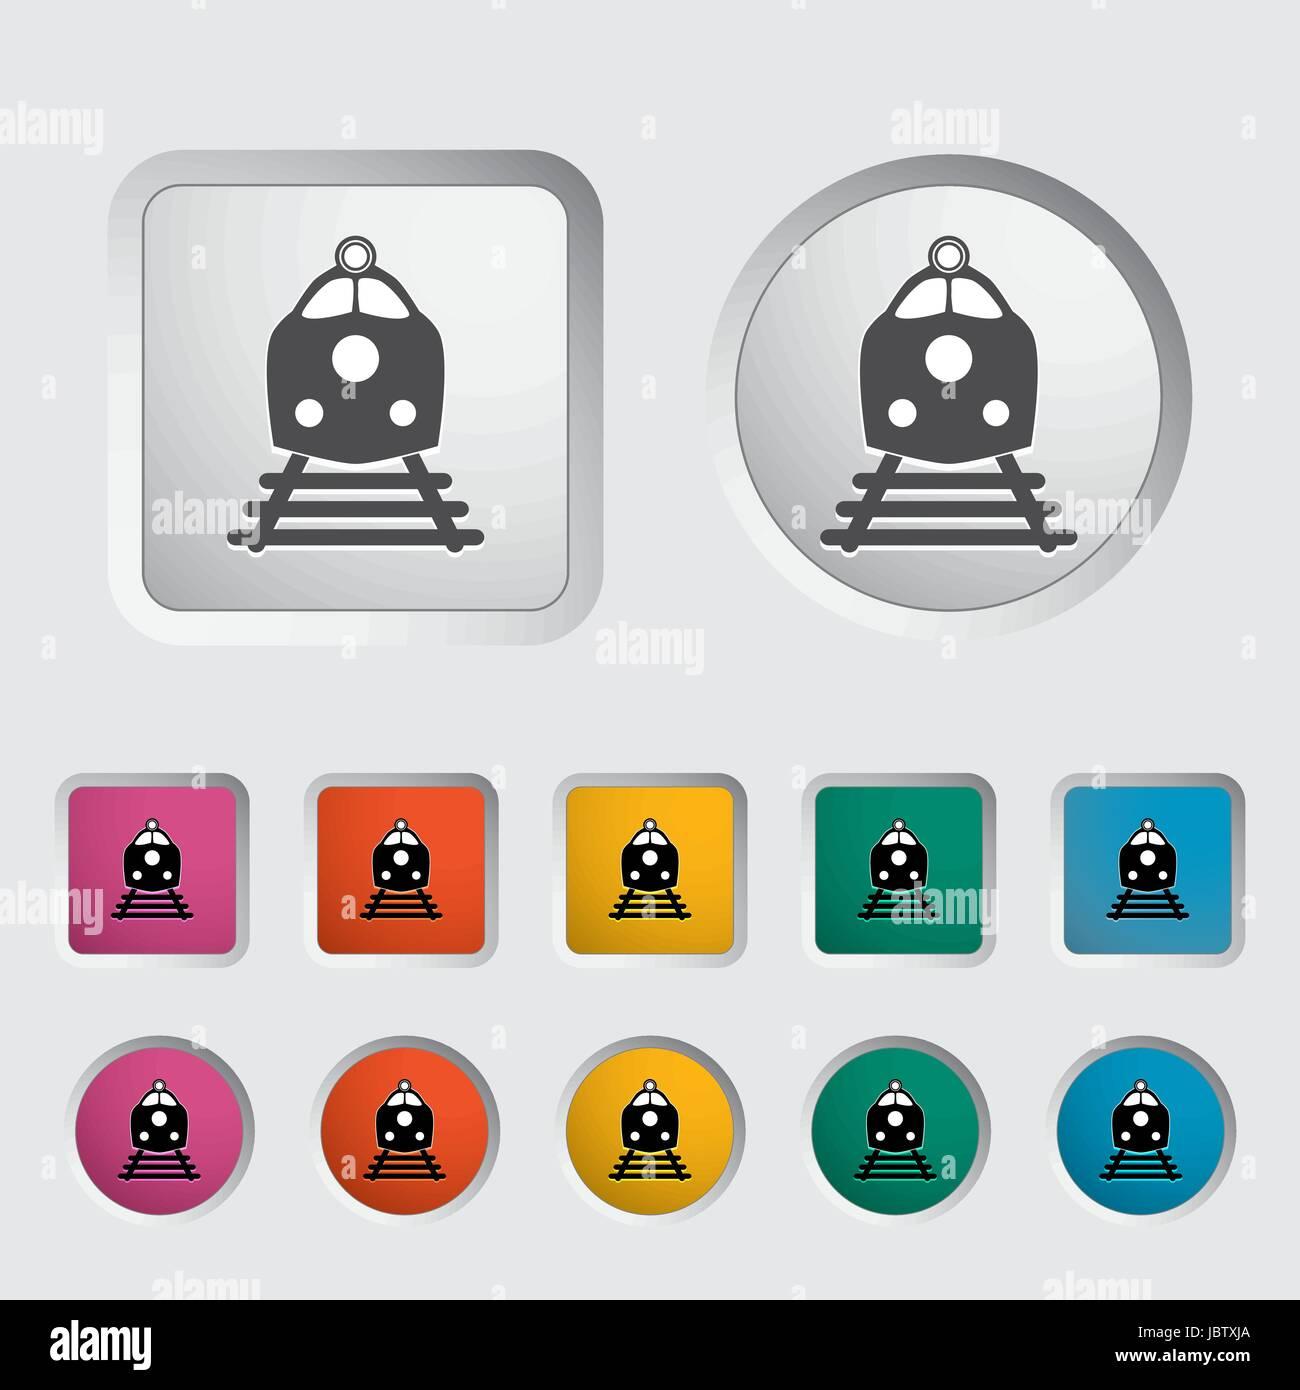 Train icon. Vector illustration EPS. - Stock Vector